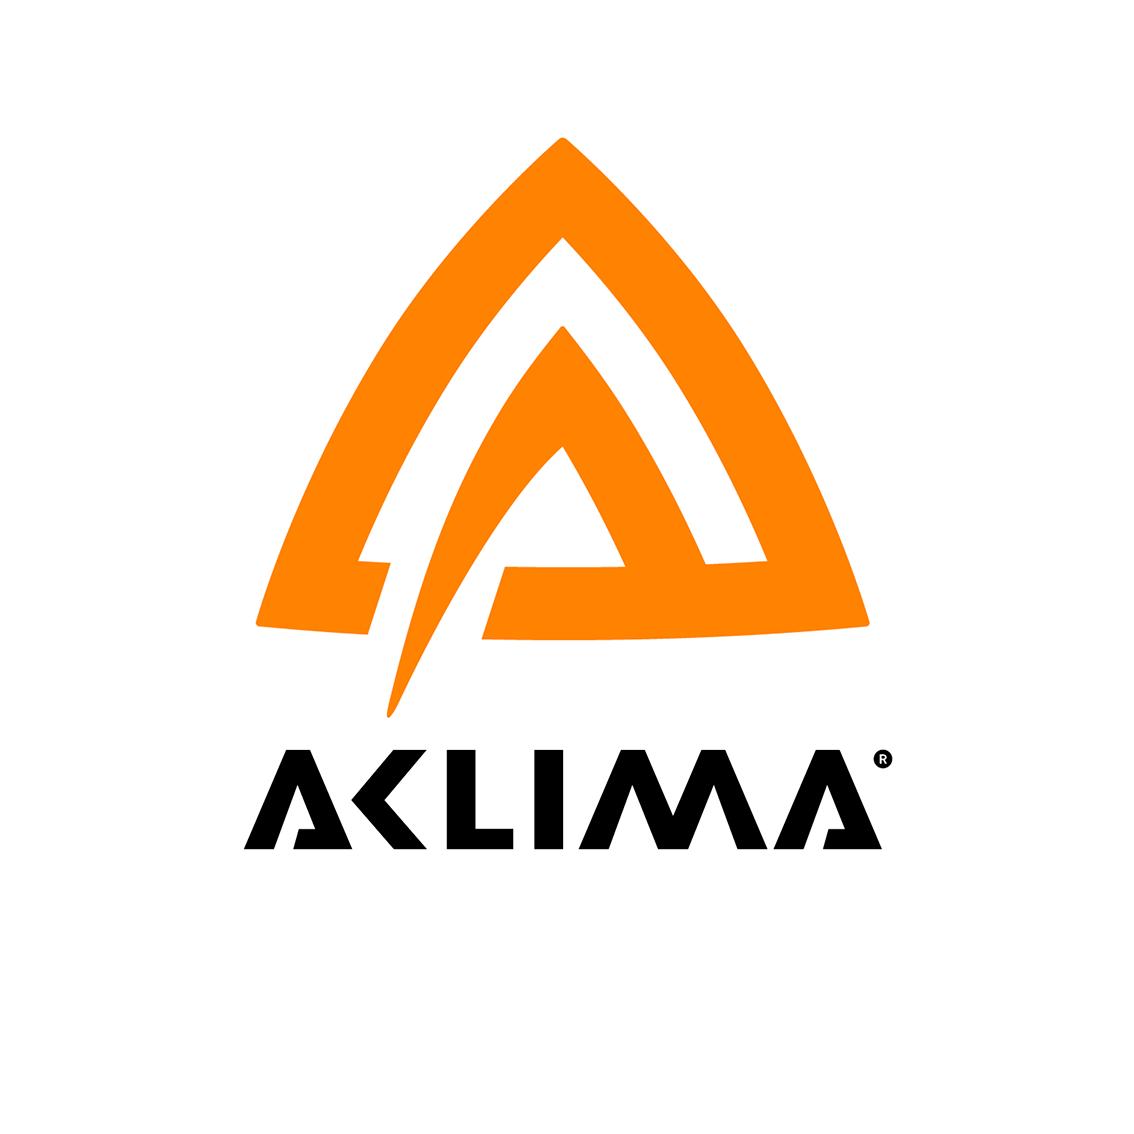 Logo Aclima